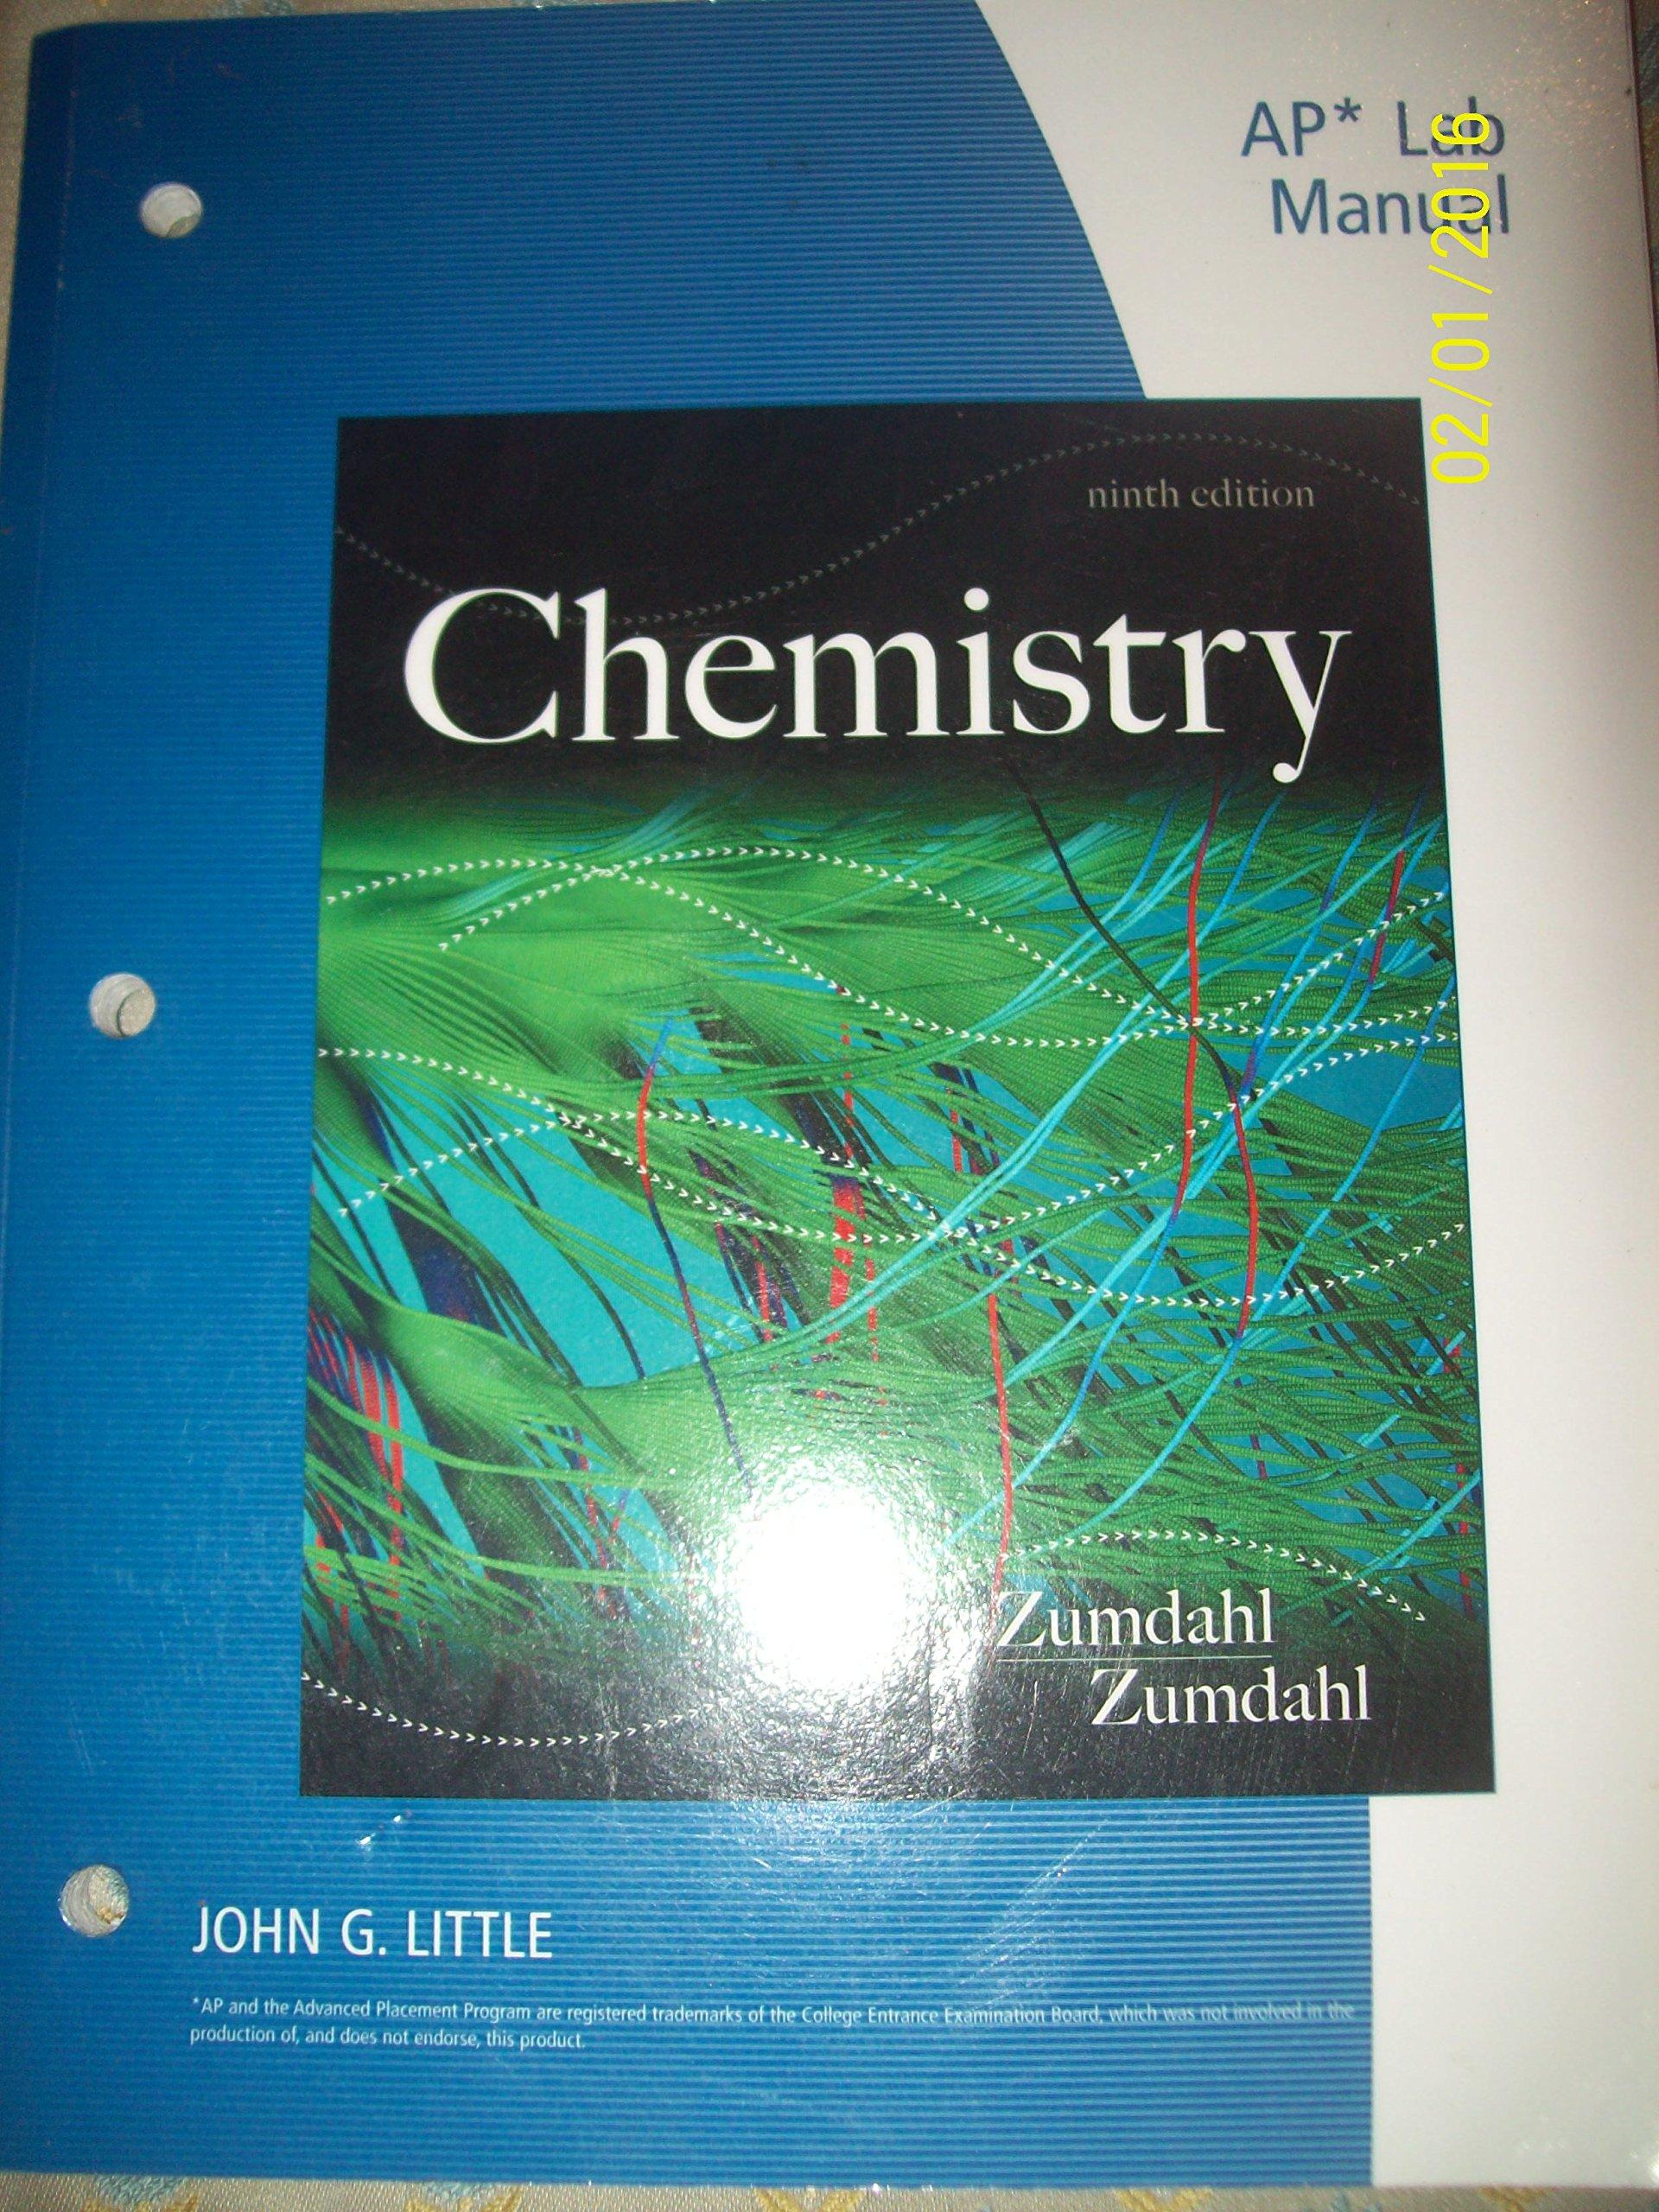 AP Lab Manual for 9th edition Chemistry Zumdahl and Zumdahl: John G Little:  9781133611493: Amazon.com: Books